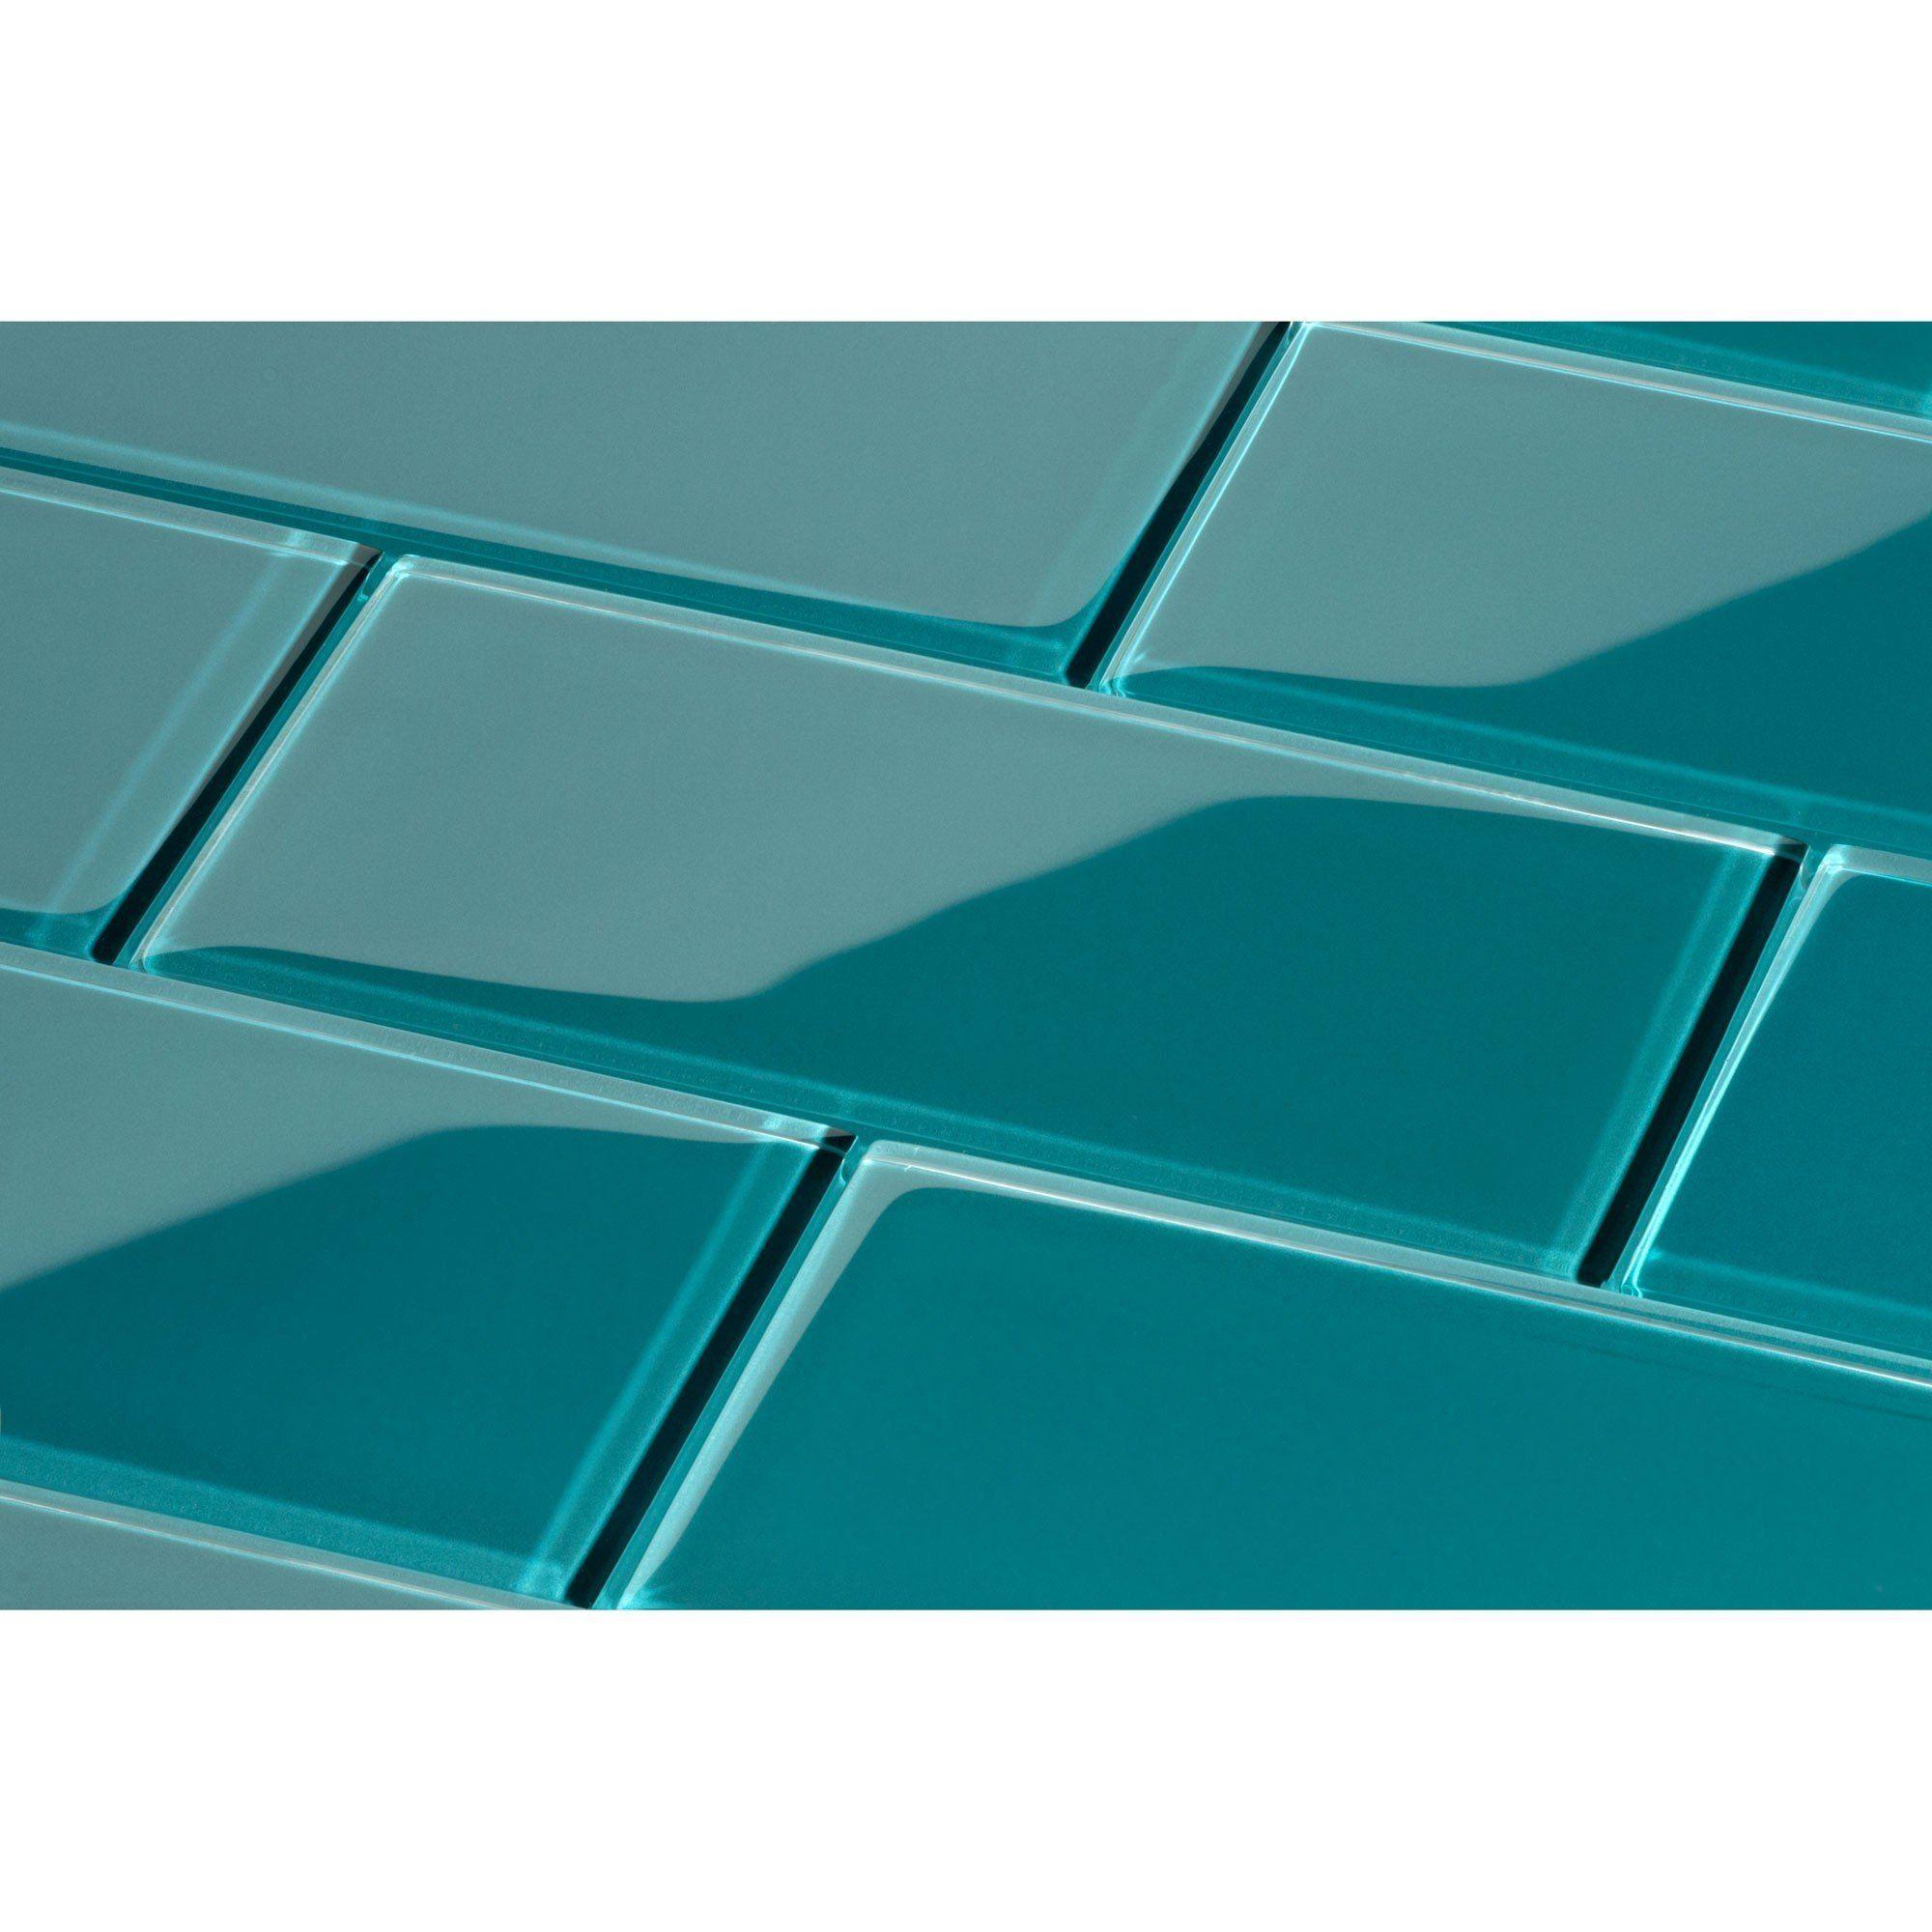 - Dark Teal Subway Tile Dark Green 3 X 6 Glass Tile Glass Subway